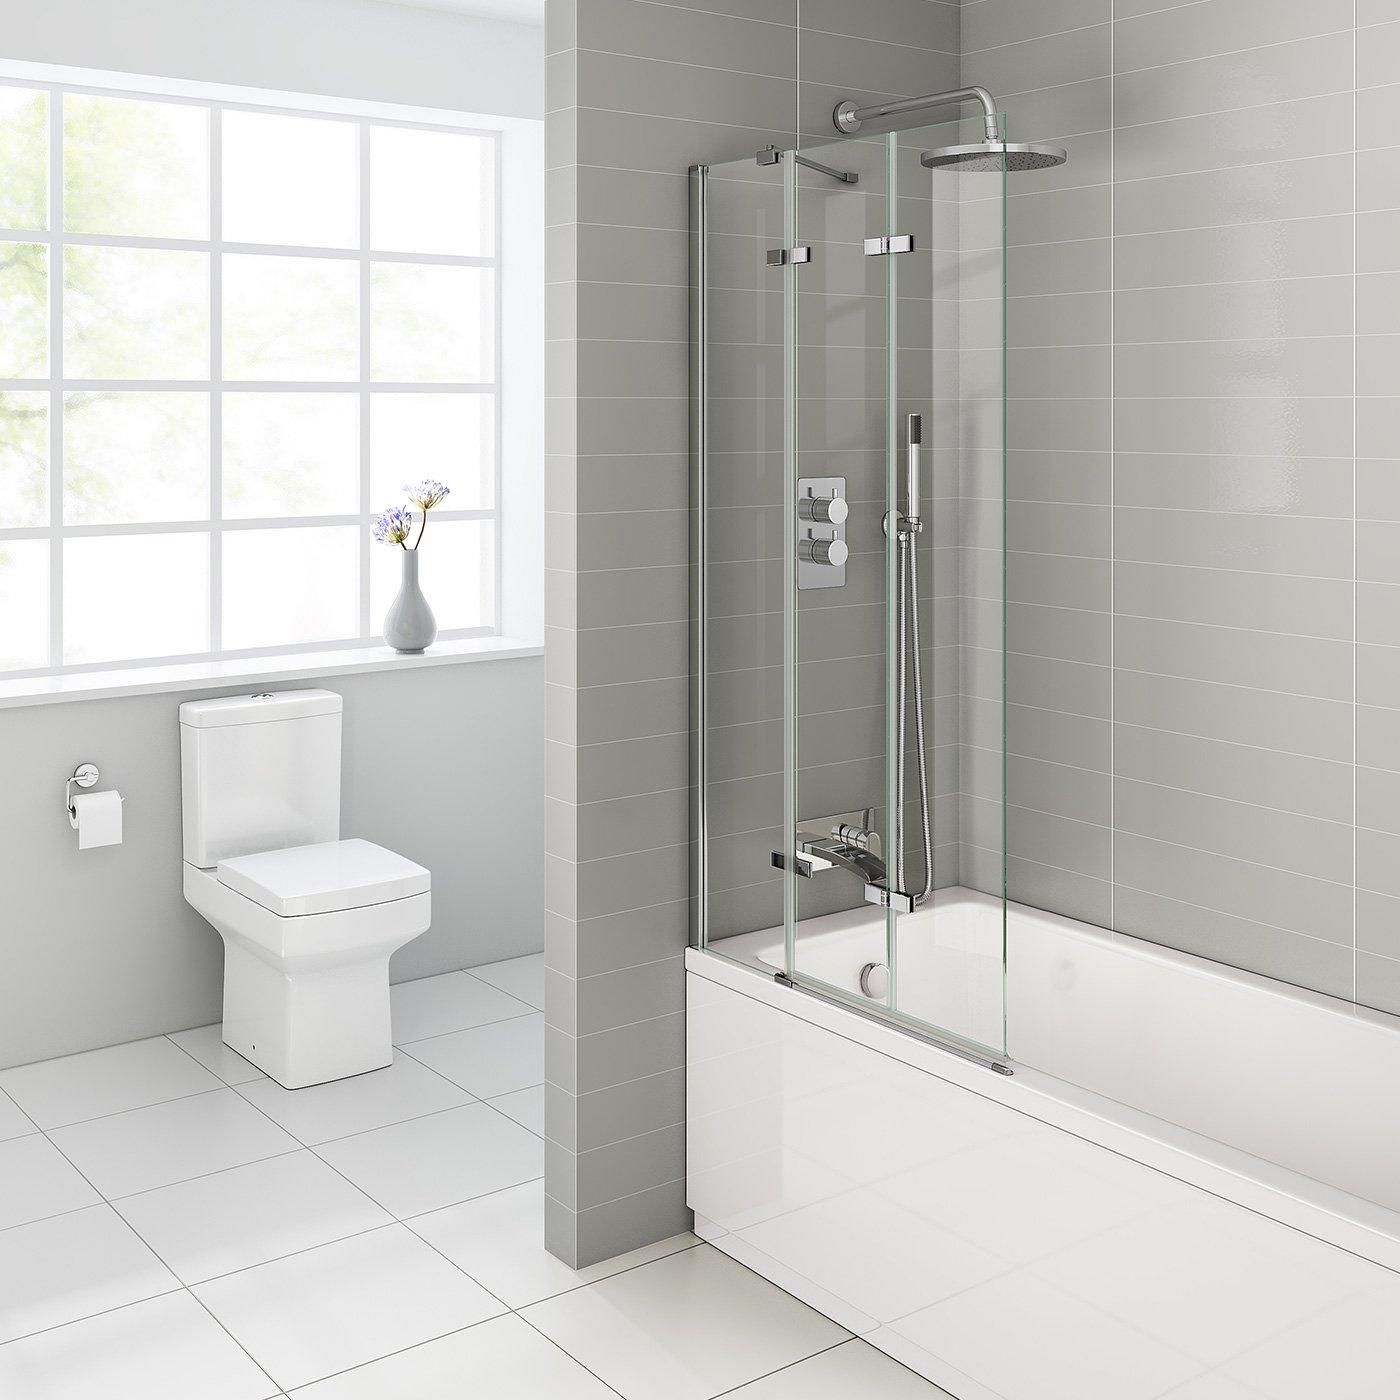 800mm Luxury Folding Bath Shower Glass Screen Pivot Door Panel   Left Hand:  IBathUK: Amazon.co.uk: Kitchen U0026 Home